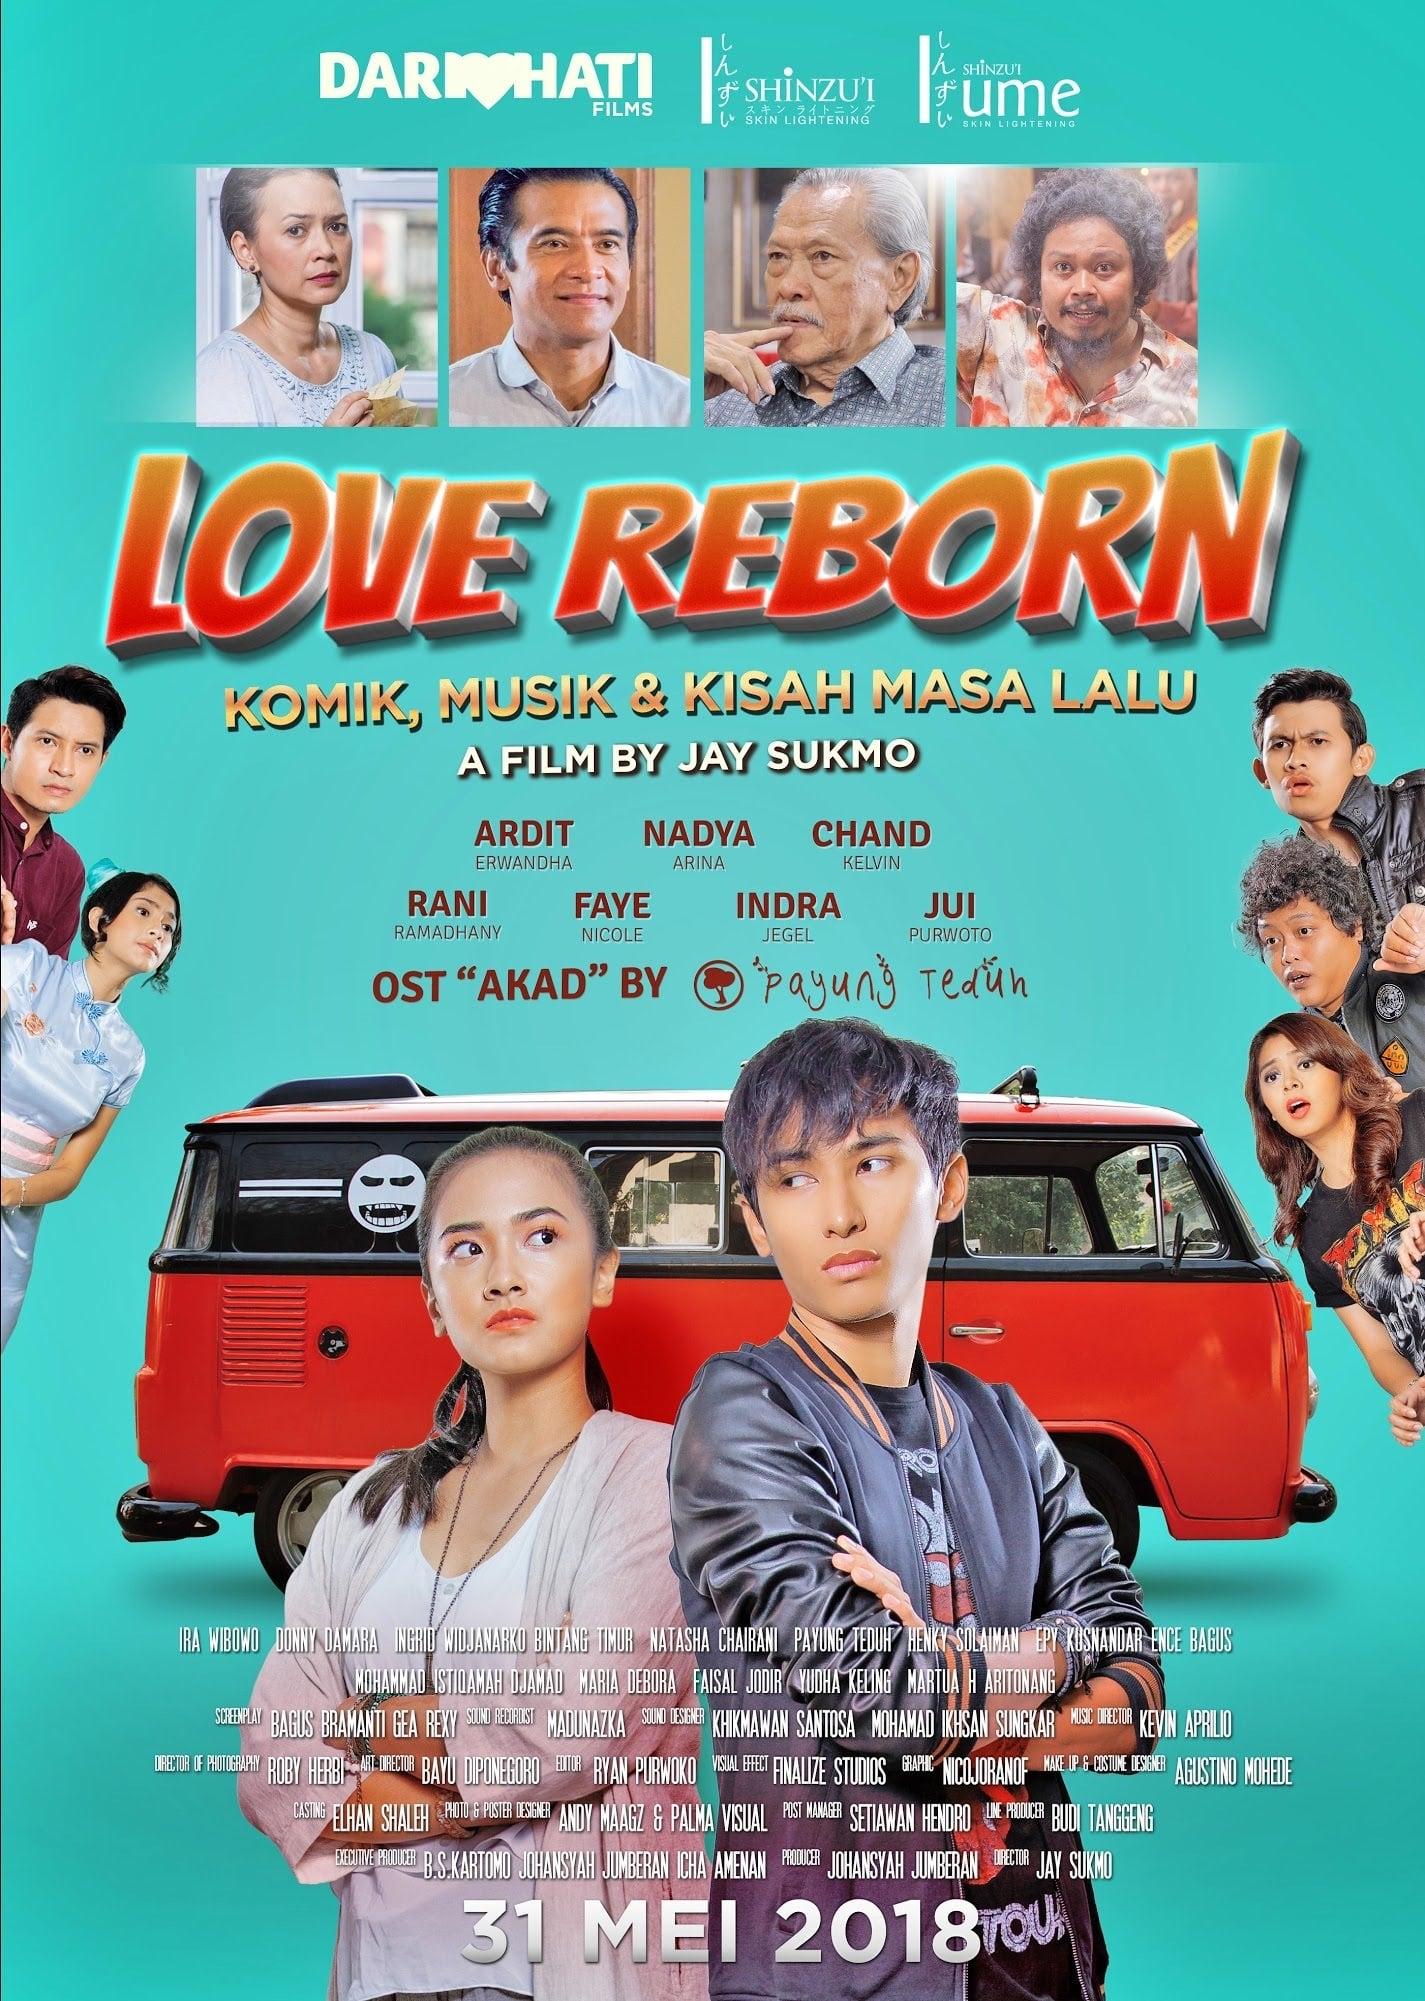 Love Reborn: Comics, Music & Stories of the Past